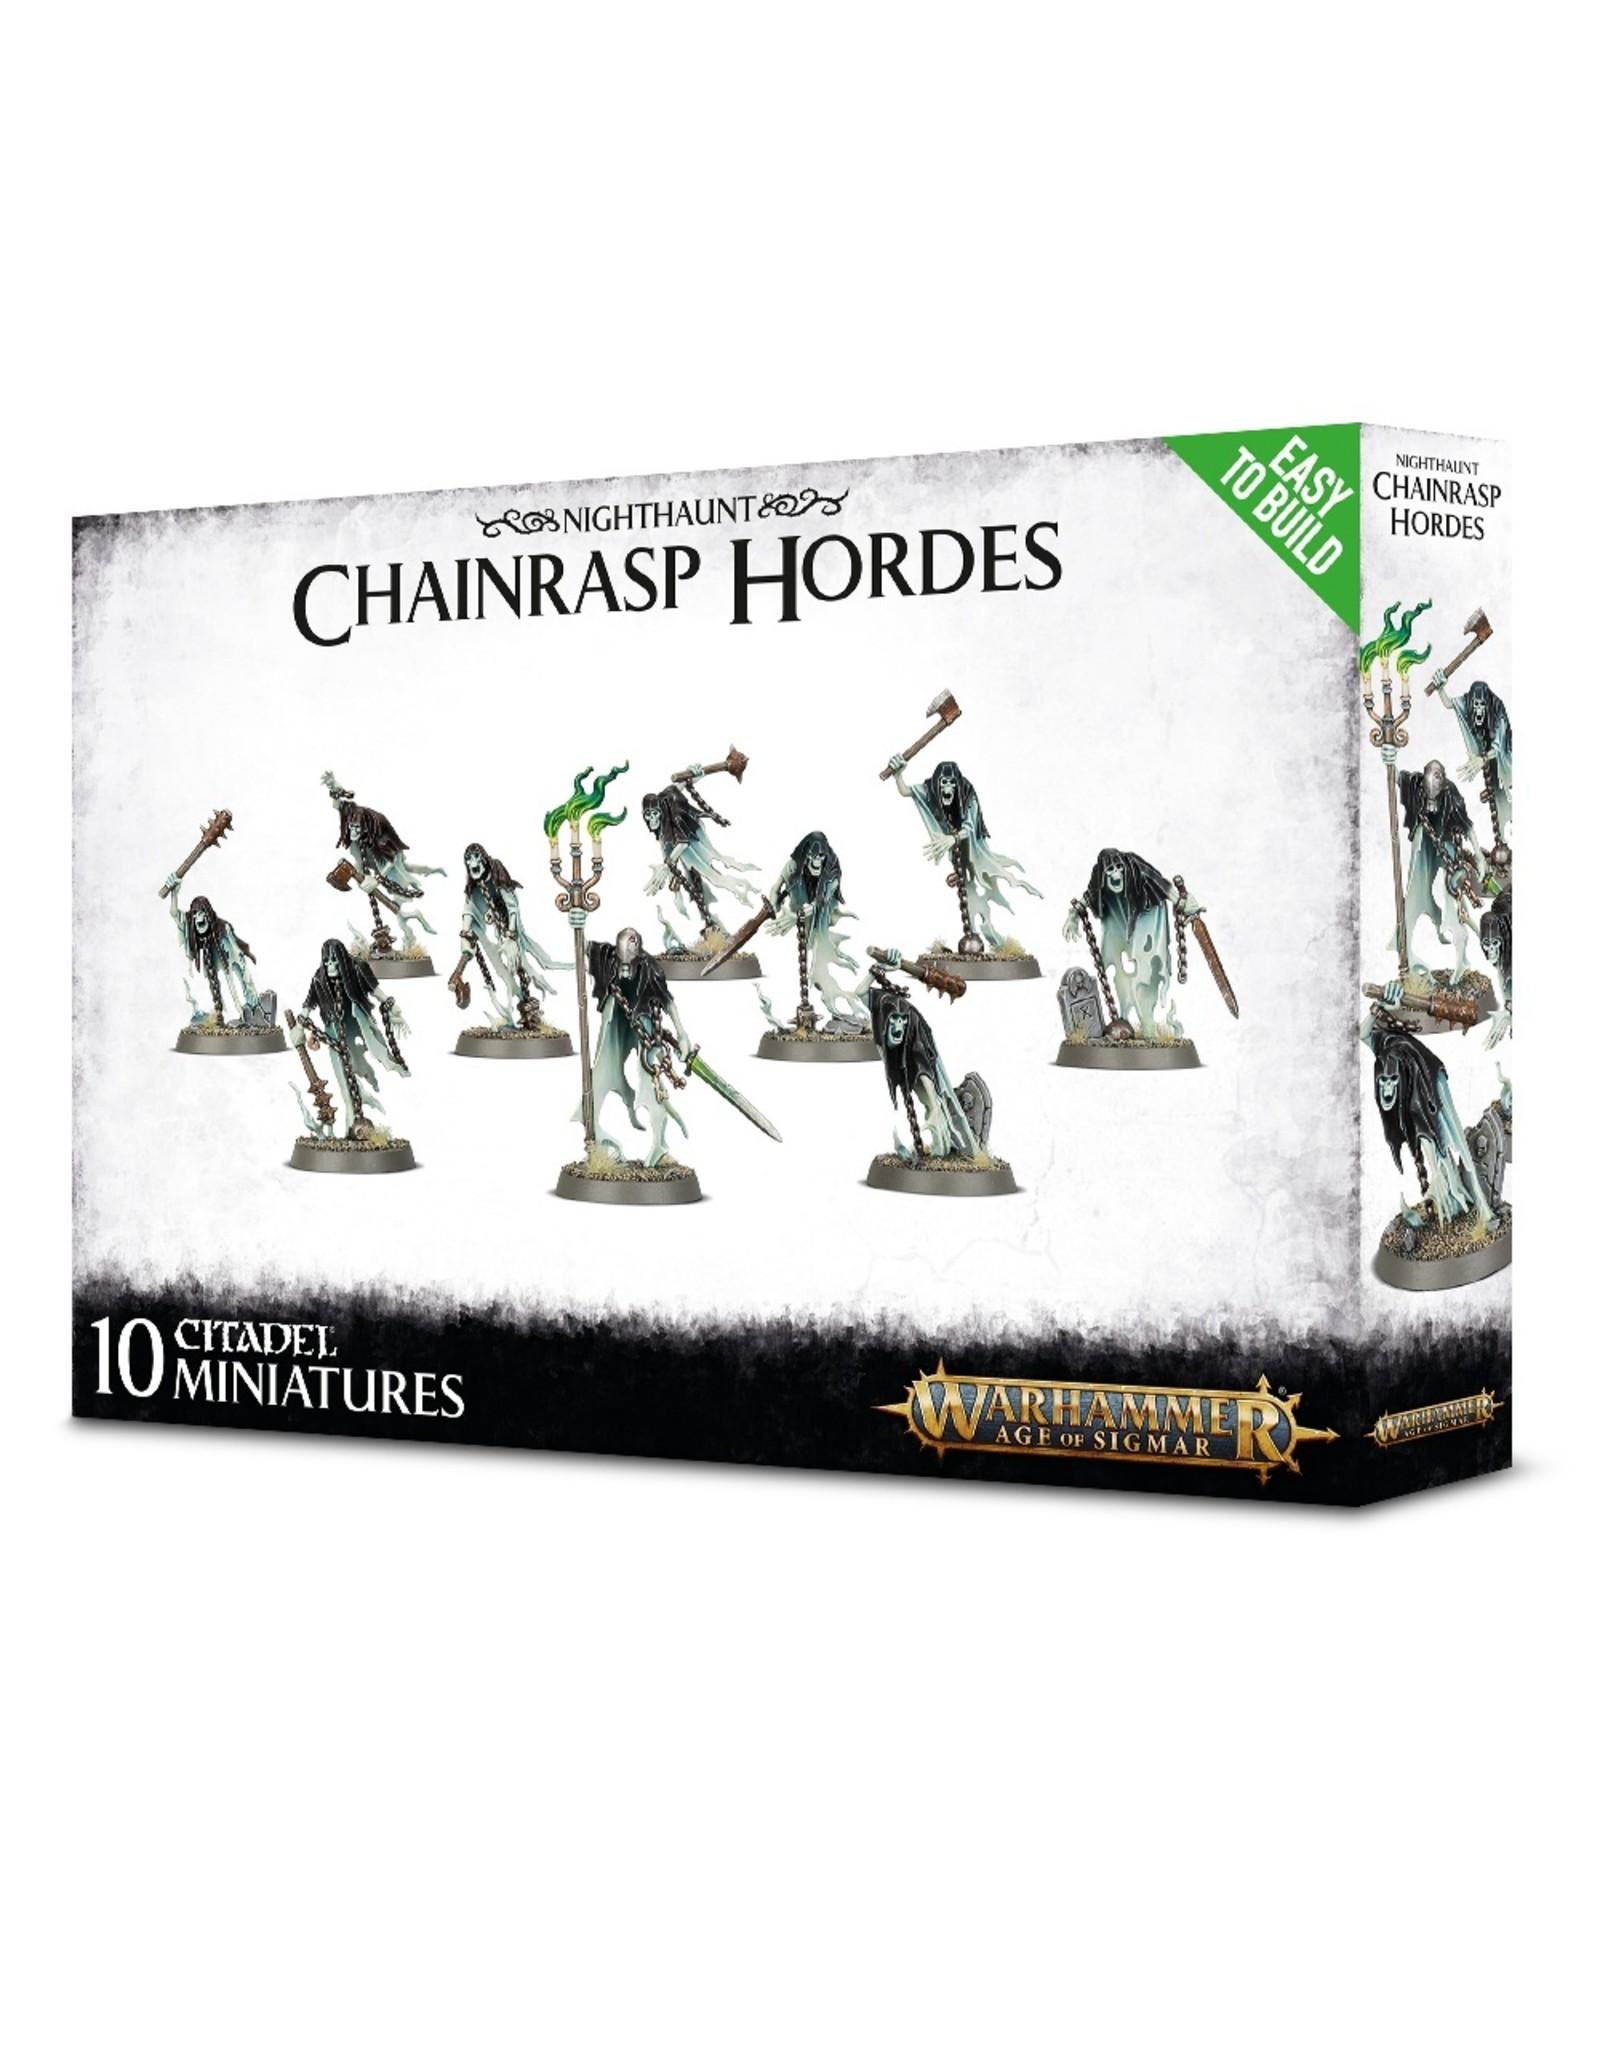 GAMES WORKSHOP WARHAMMER AGE OF SIGMAR EASY TO BUILD NIGHTHAUNT CHAINRASP HORDES